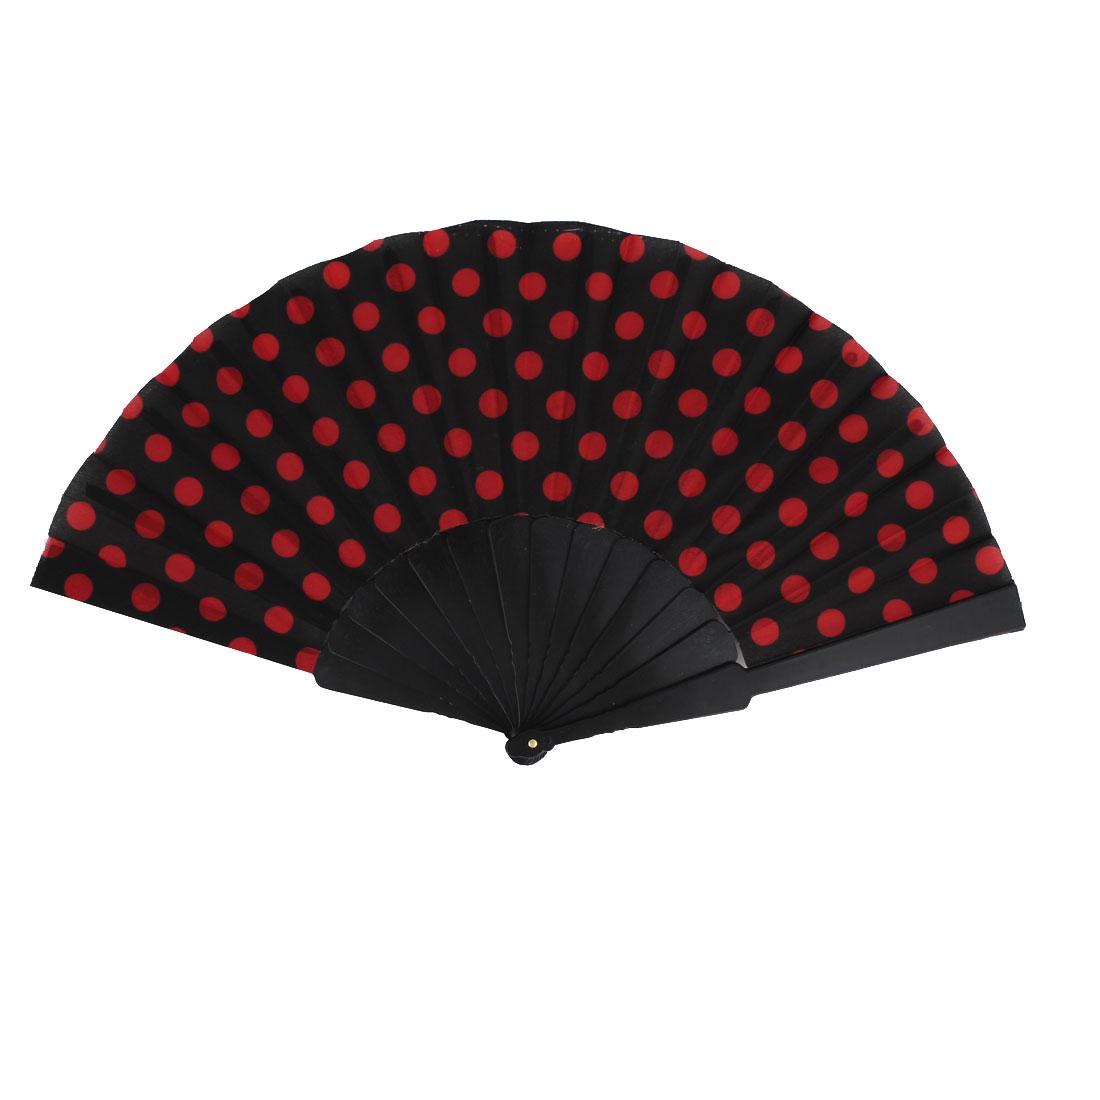 Unisex Summer Handy Plastic Frame Red Dots Pattern Folding Fanning Hand Fan Black